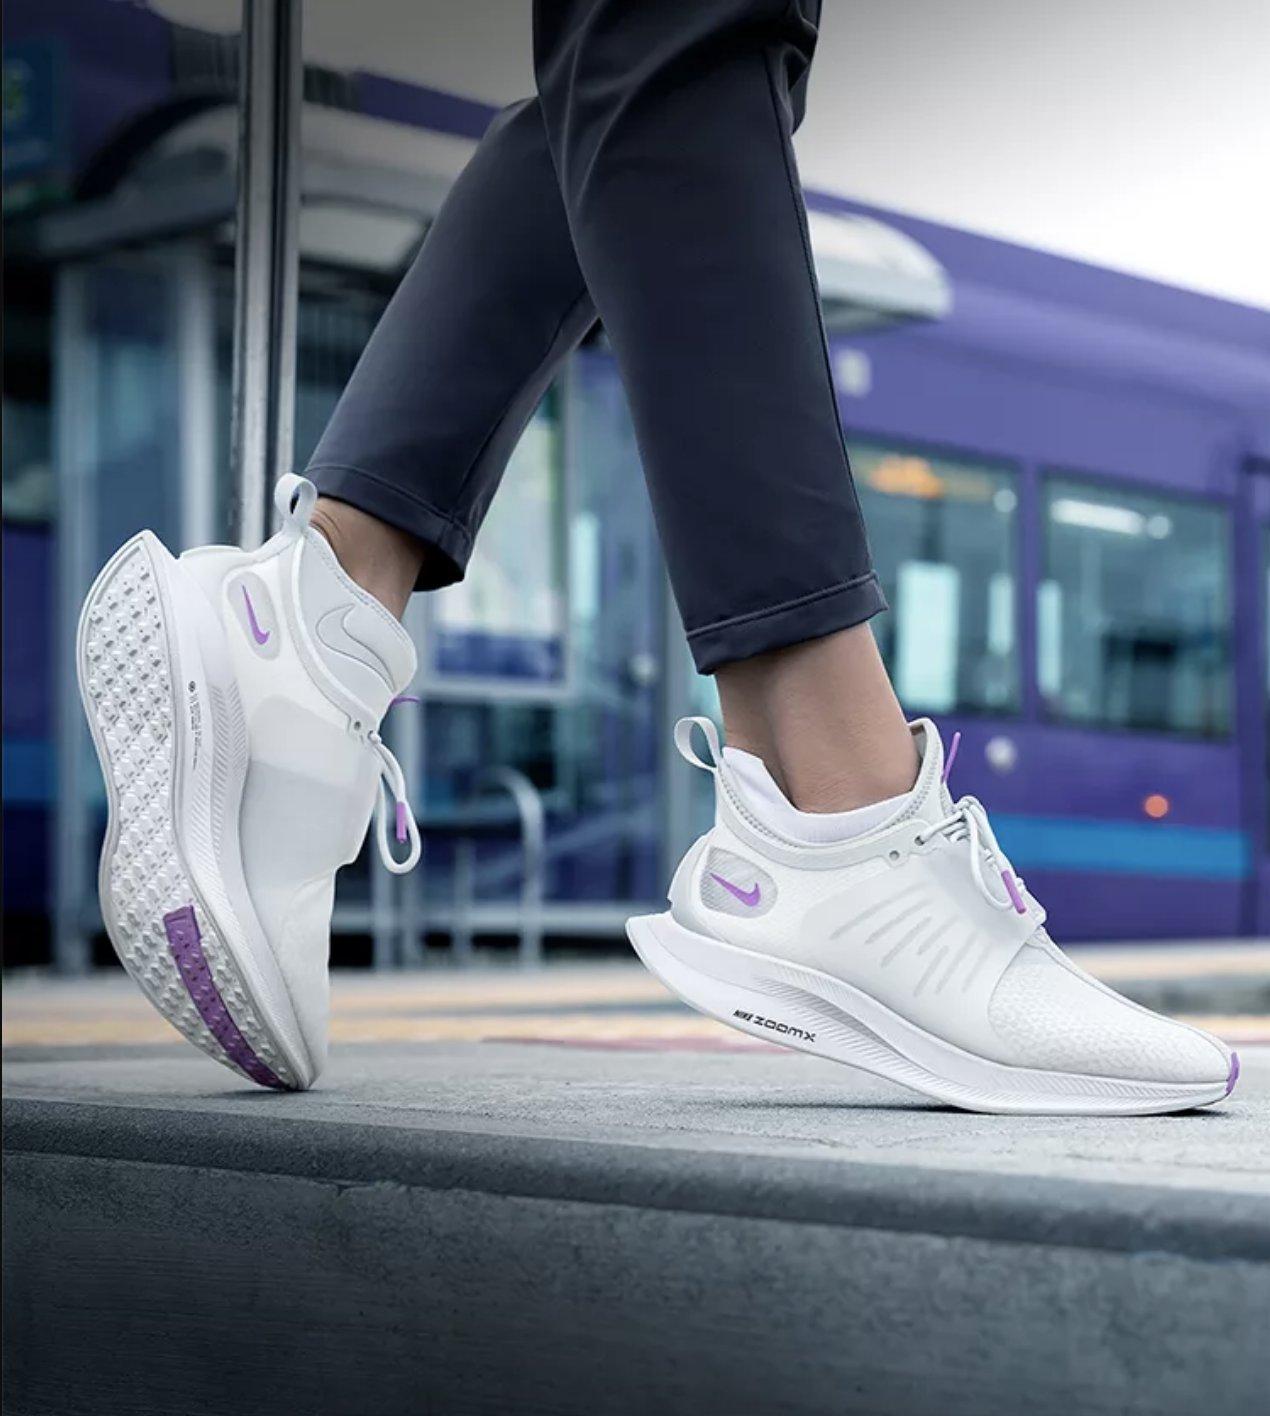 Kicks Deals – Official Website 10 Best Kicks UNDER Retail At